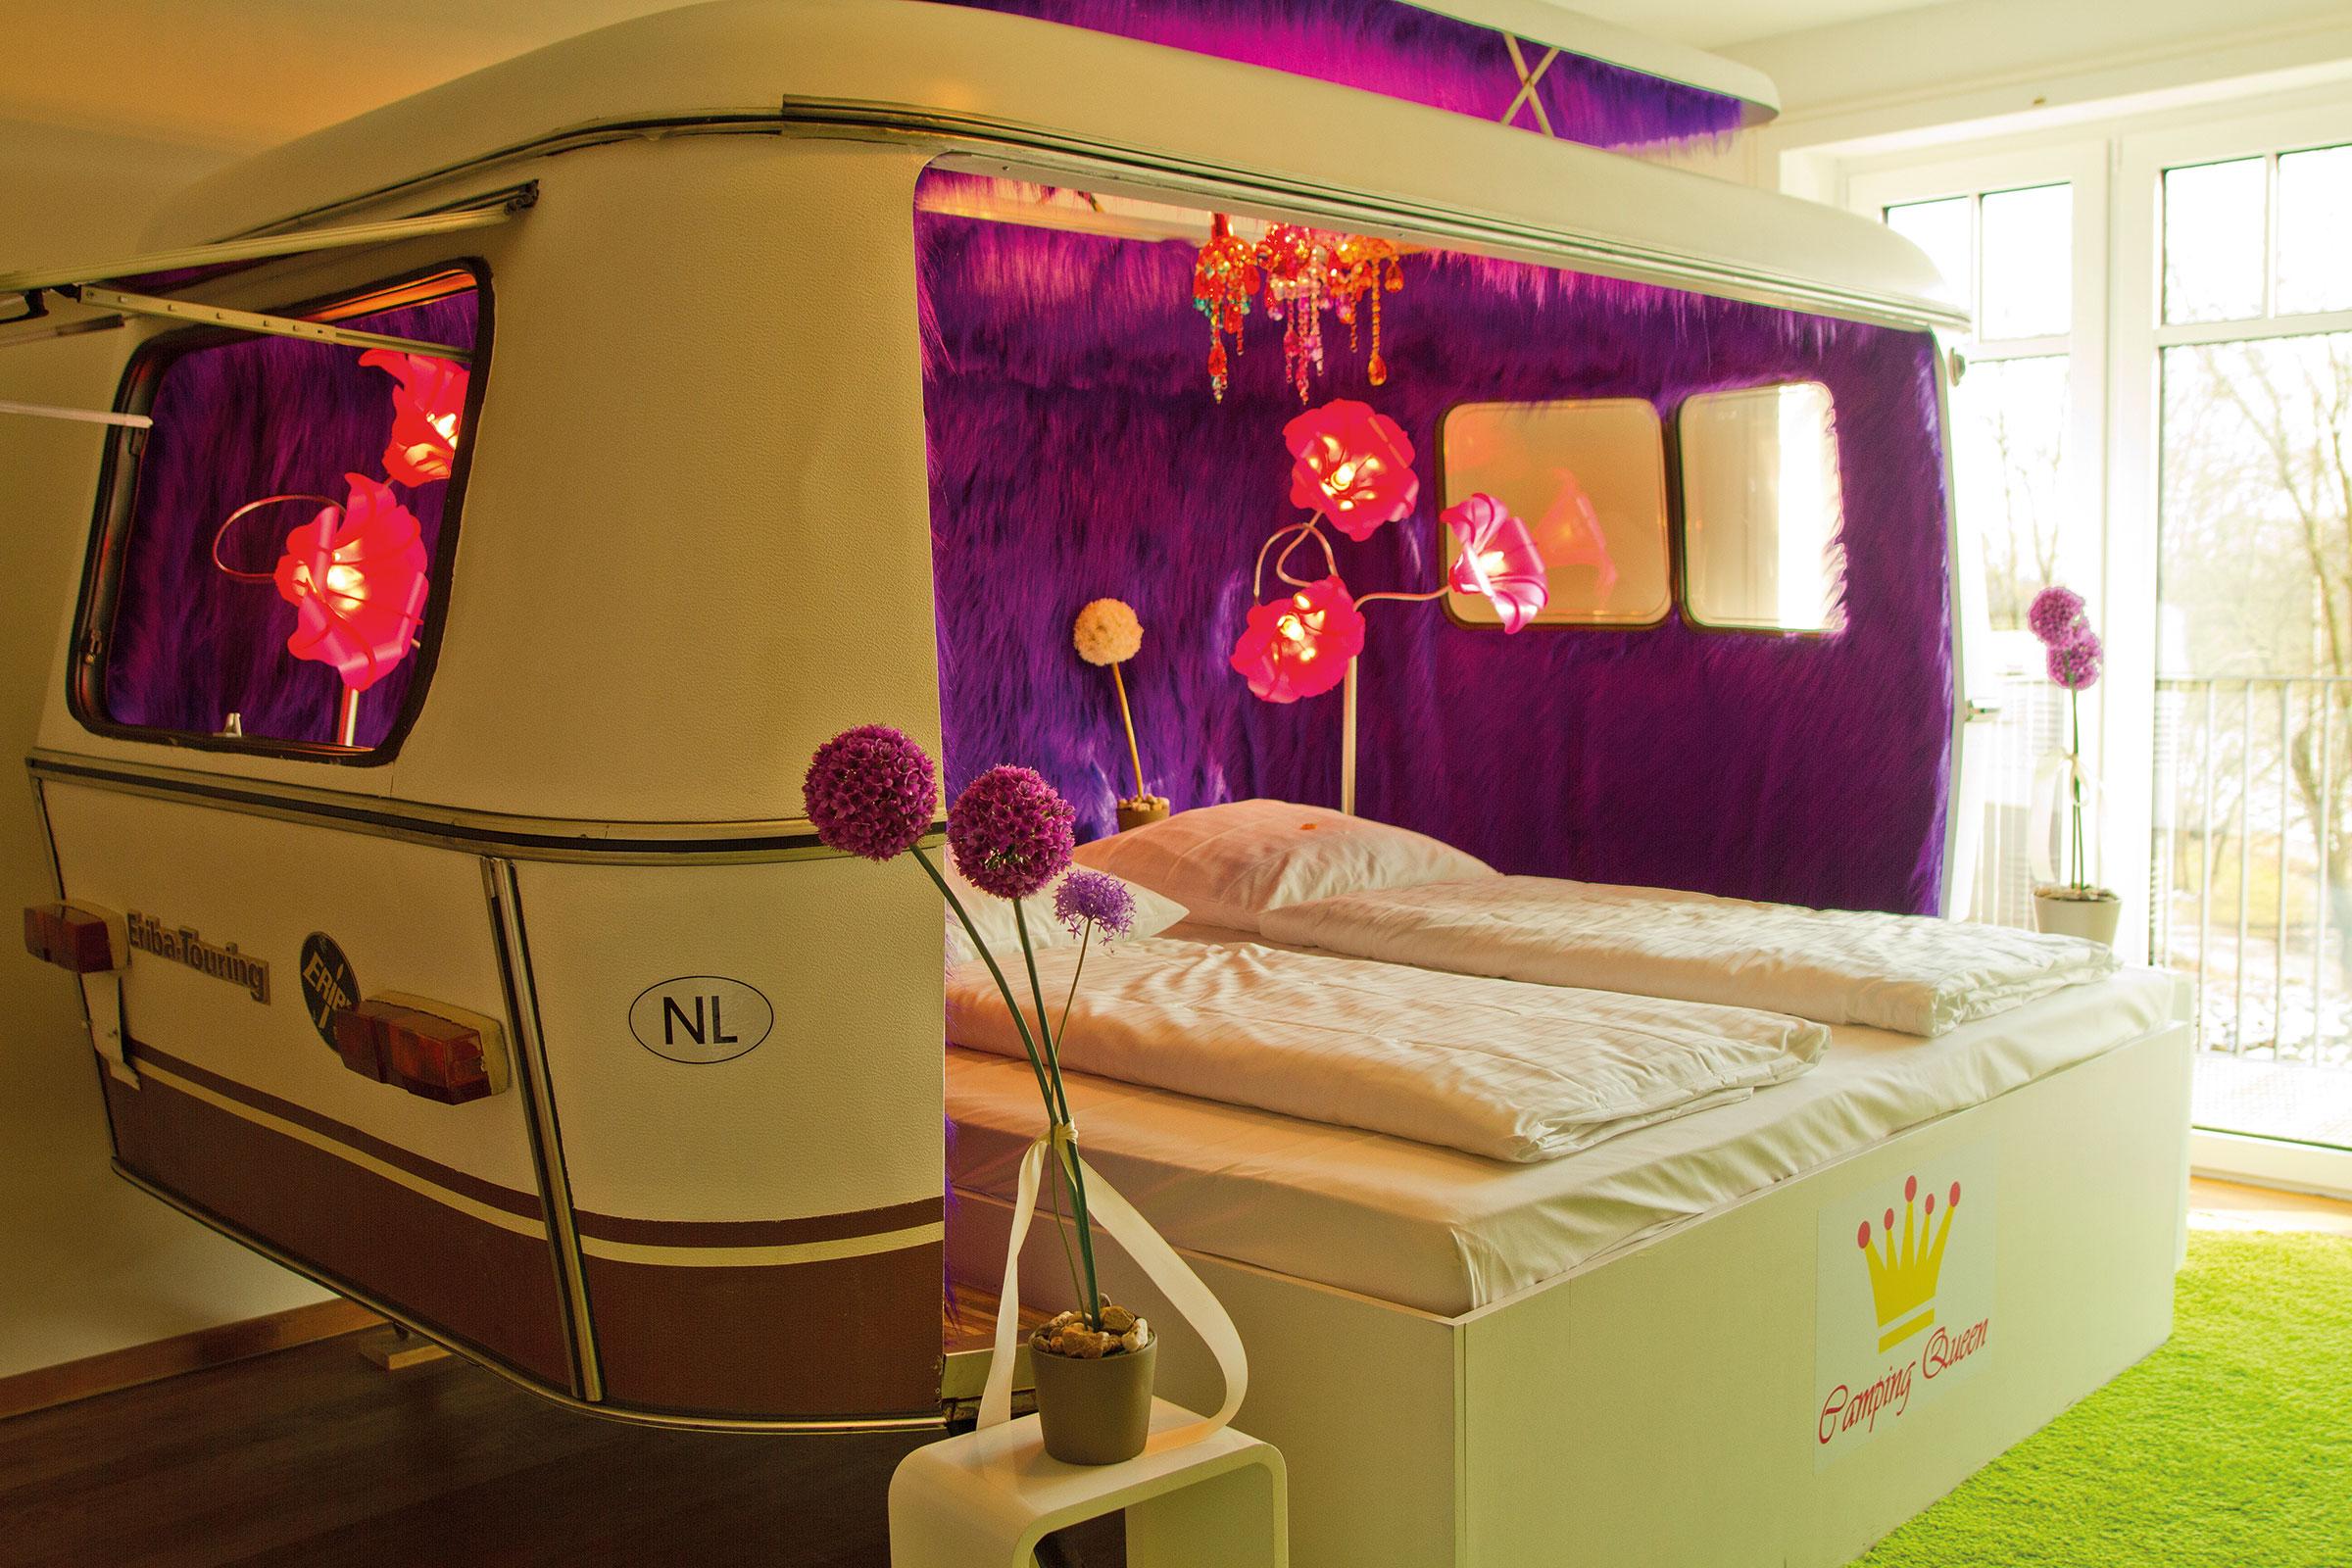 Kuriose Hotels Beverland_Campervan